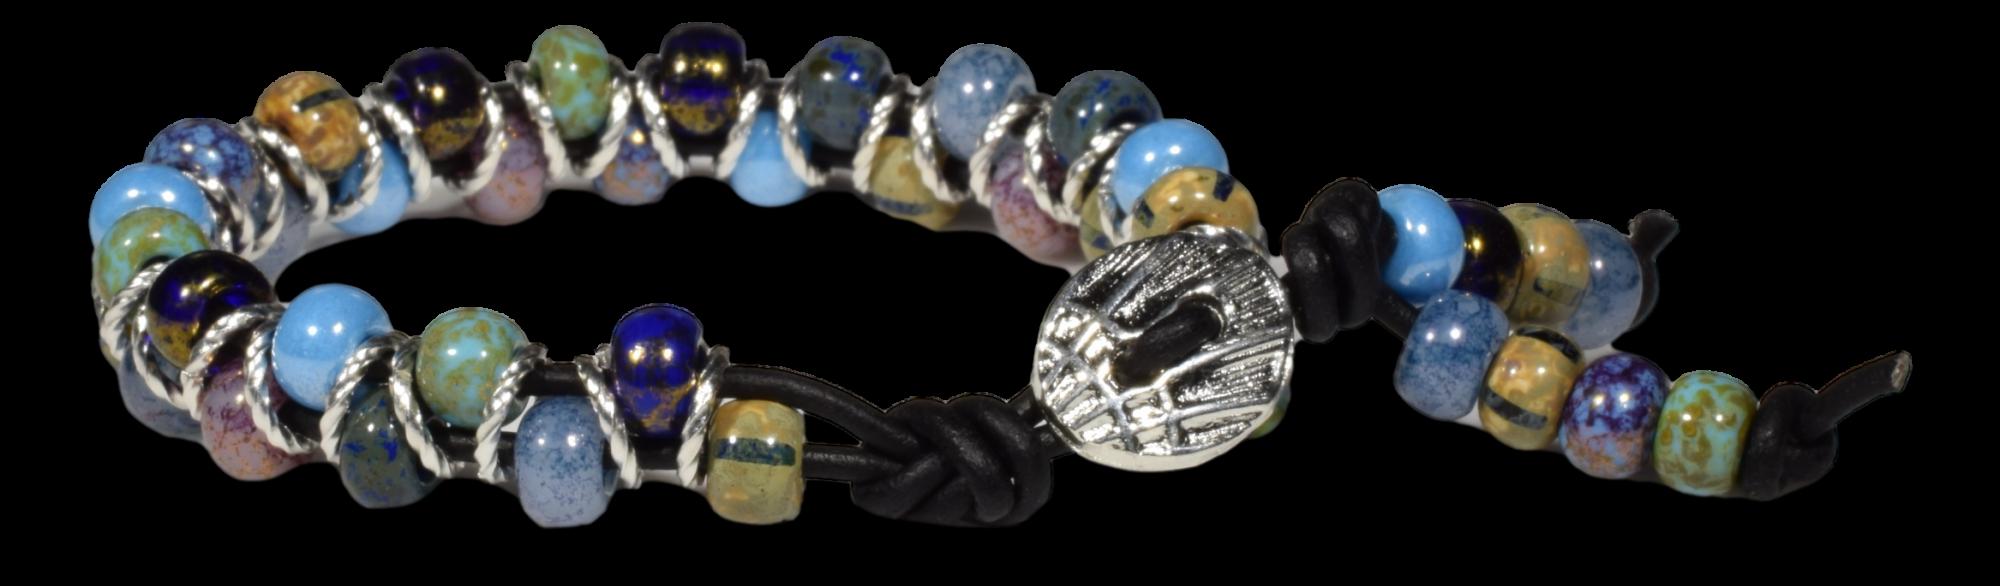 Czech Glass Bead Zig Zag Bracelet Kit